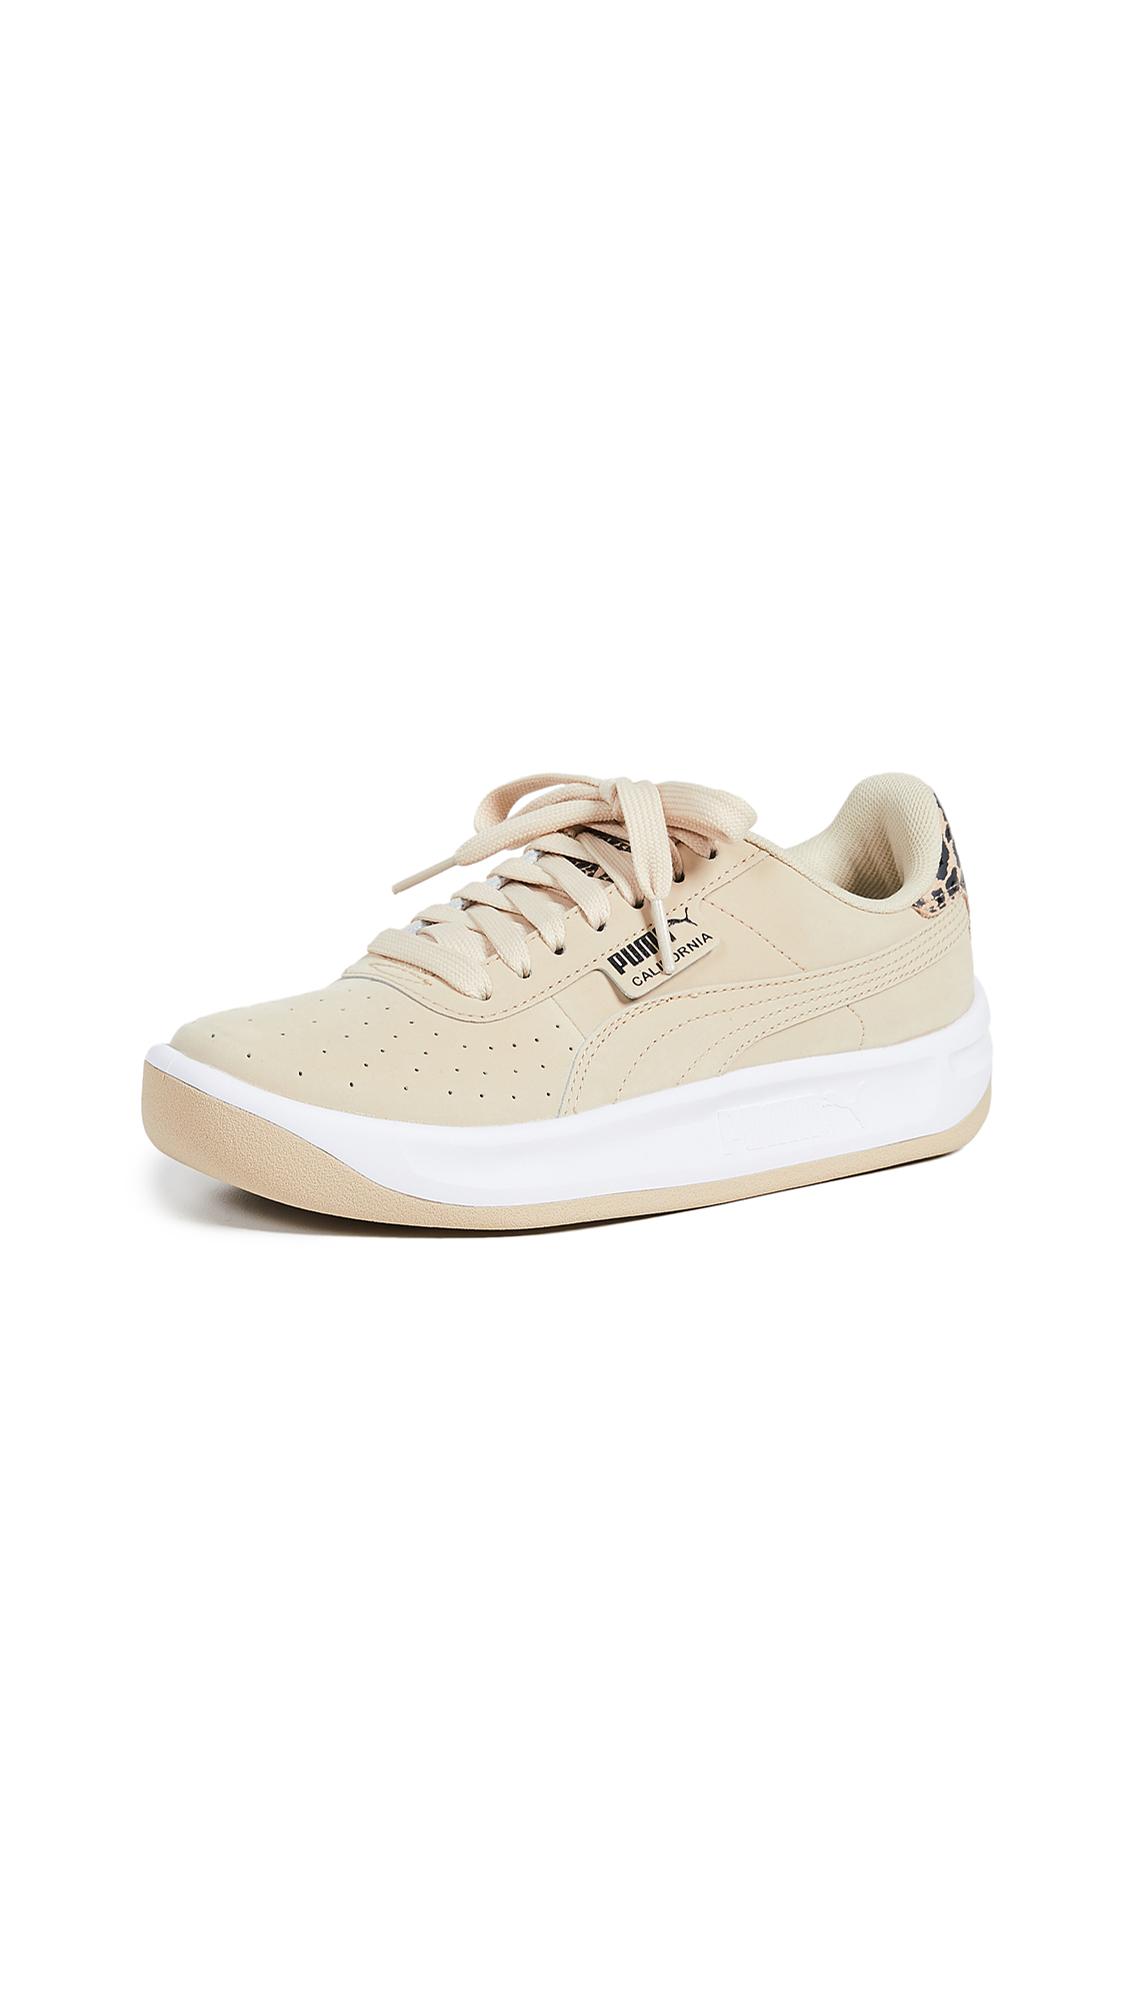 PUMA California Wild Sneakers